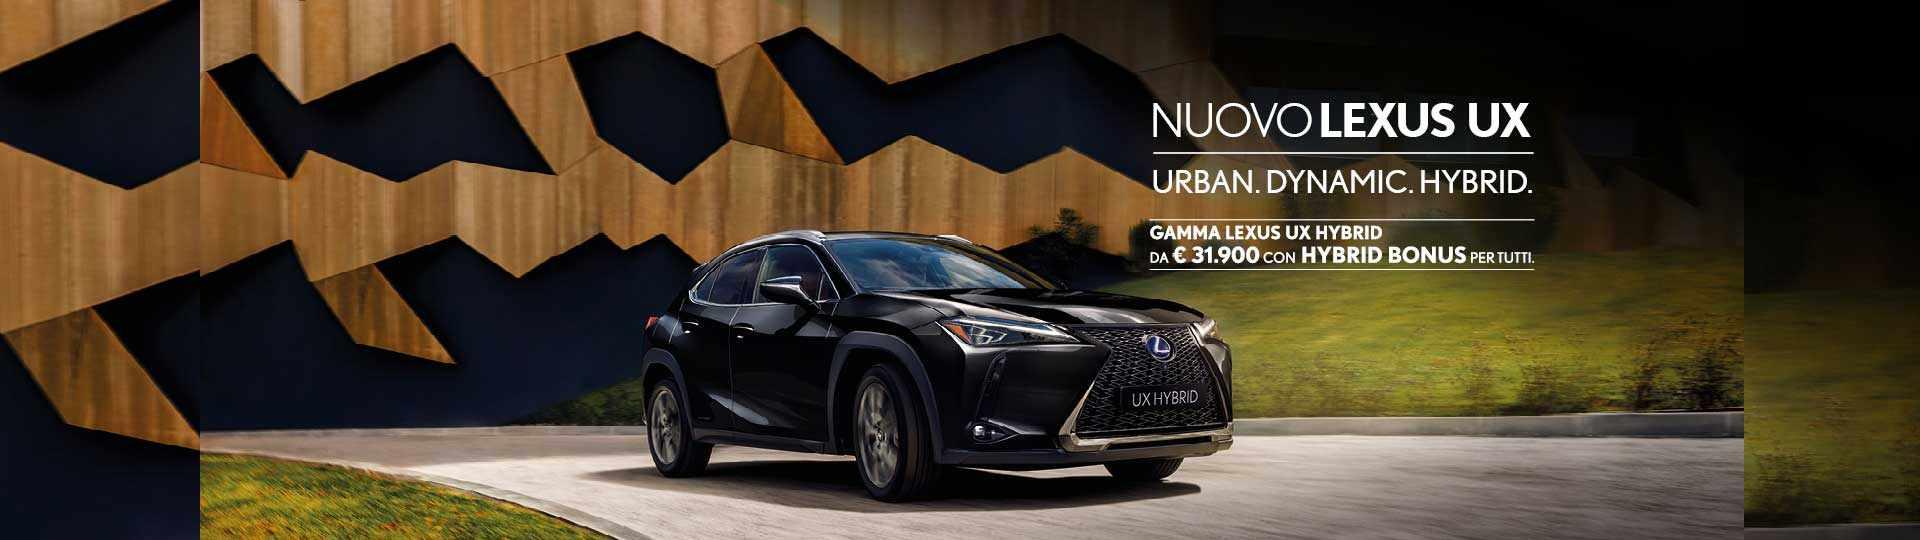 Lexus-UX_sito-min.jpg